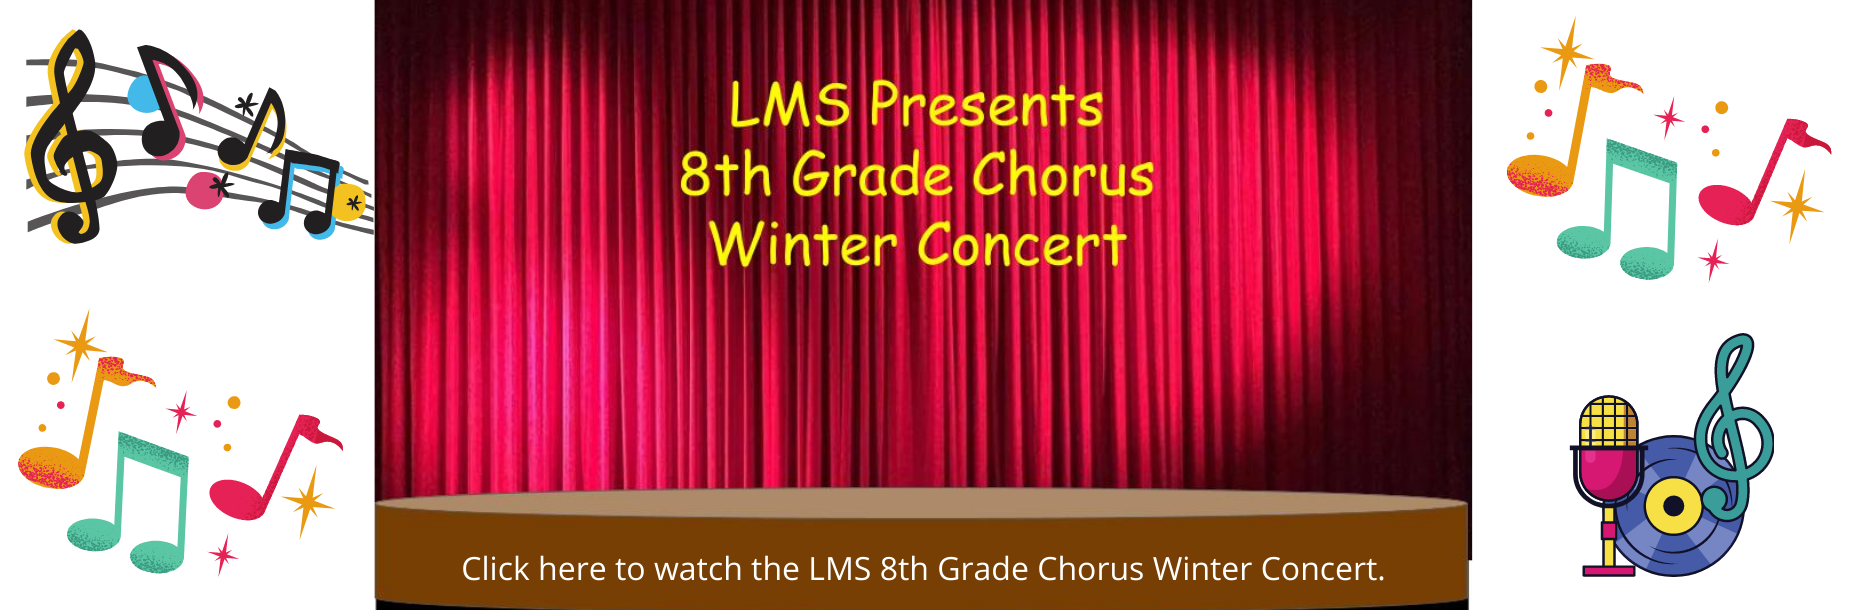 8th grade winter concert link